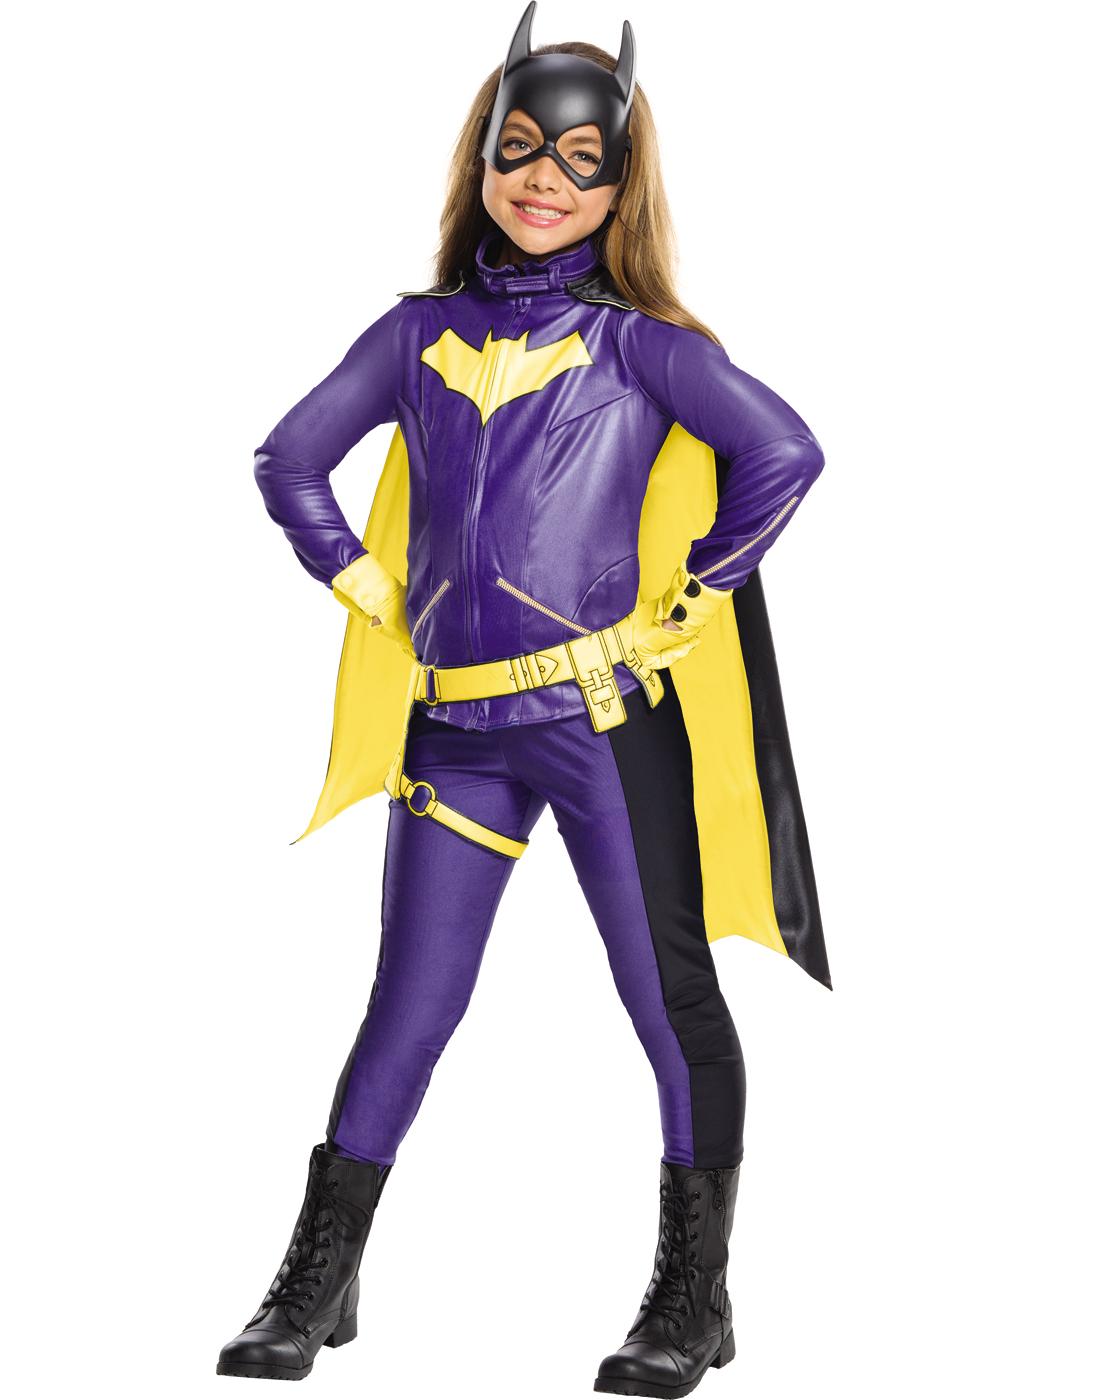 Marvelous Details About Dc Comics Girls Premium Classic Batgirl Superhero Halloween  Costume